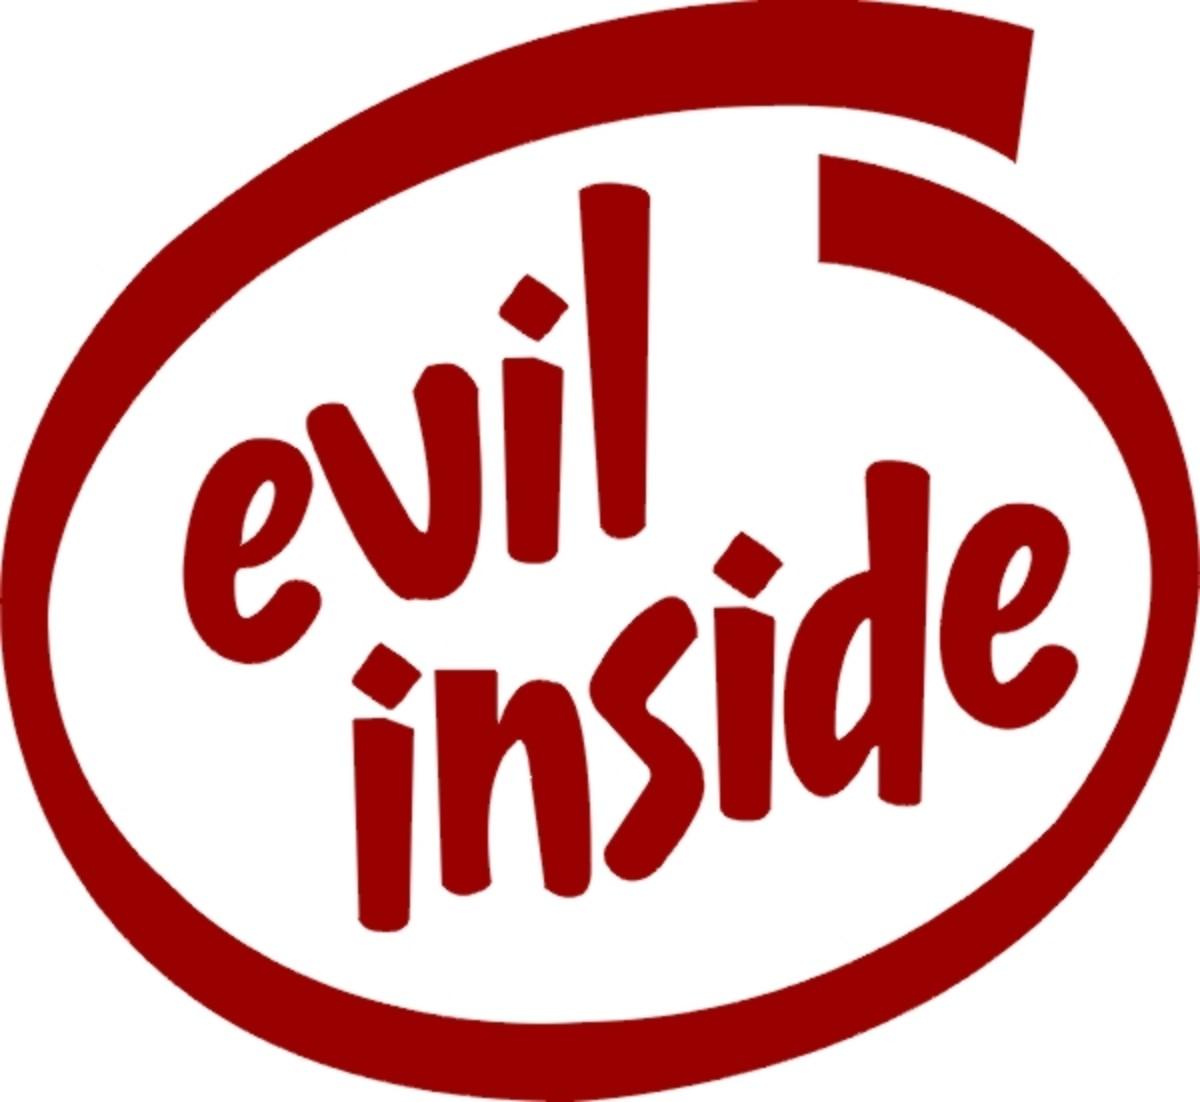 literary-analysis-bt-evilpants